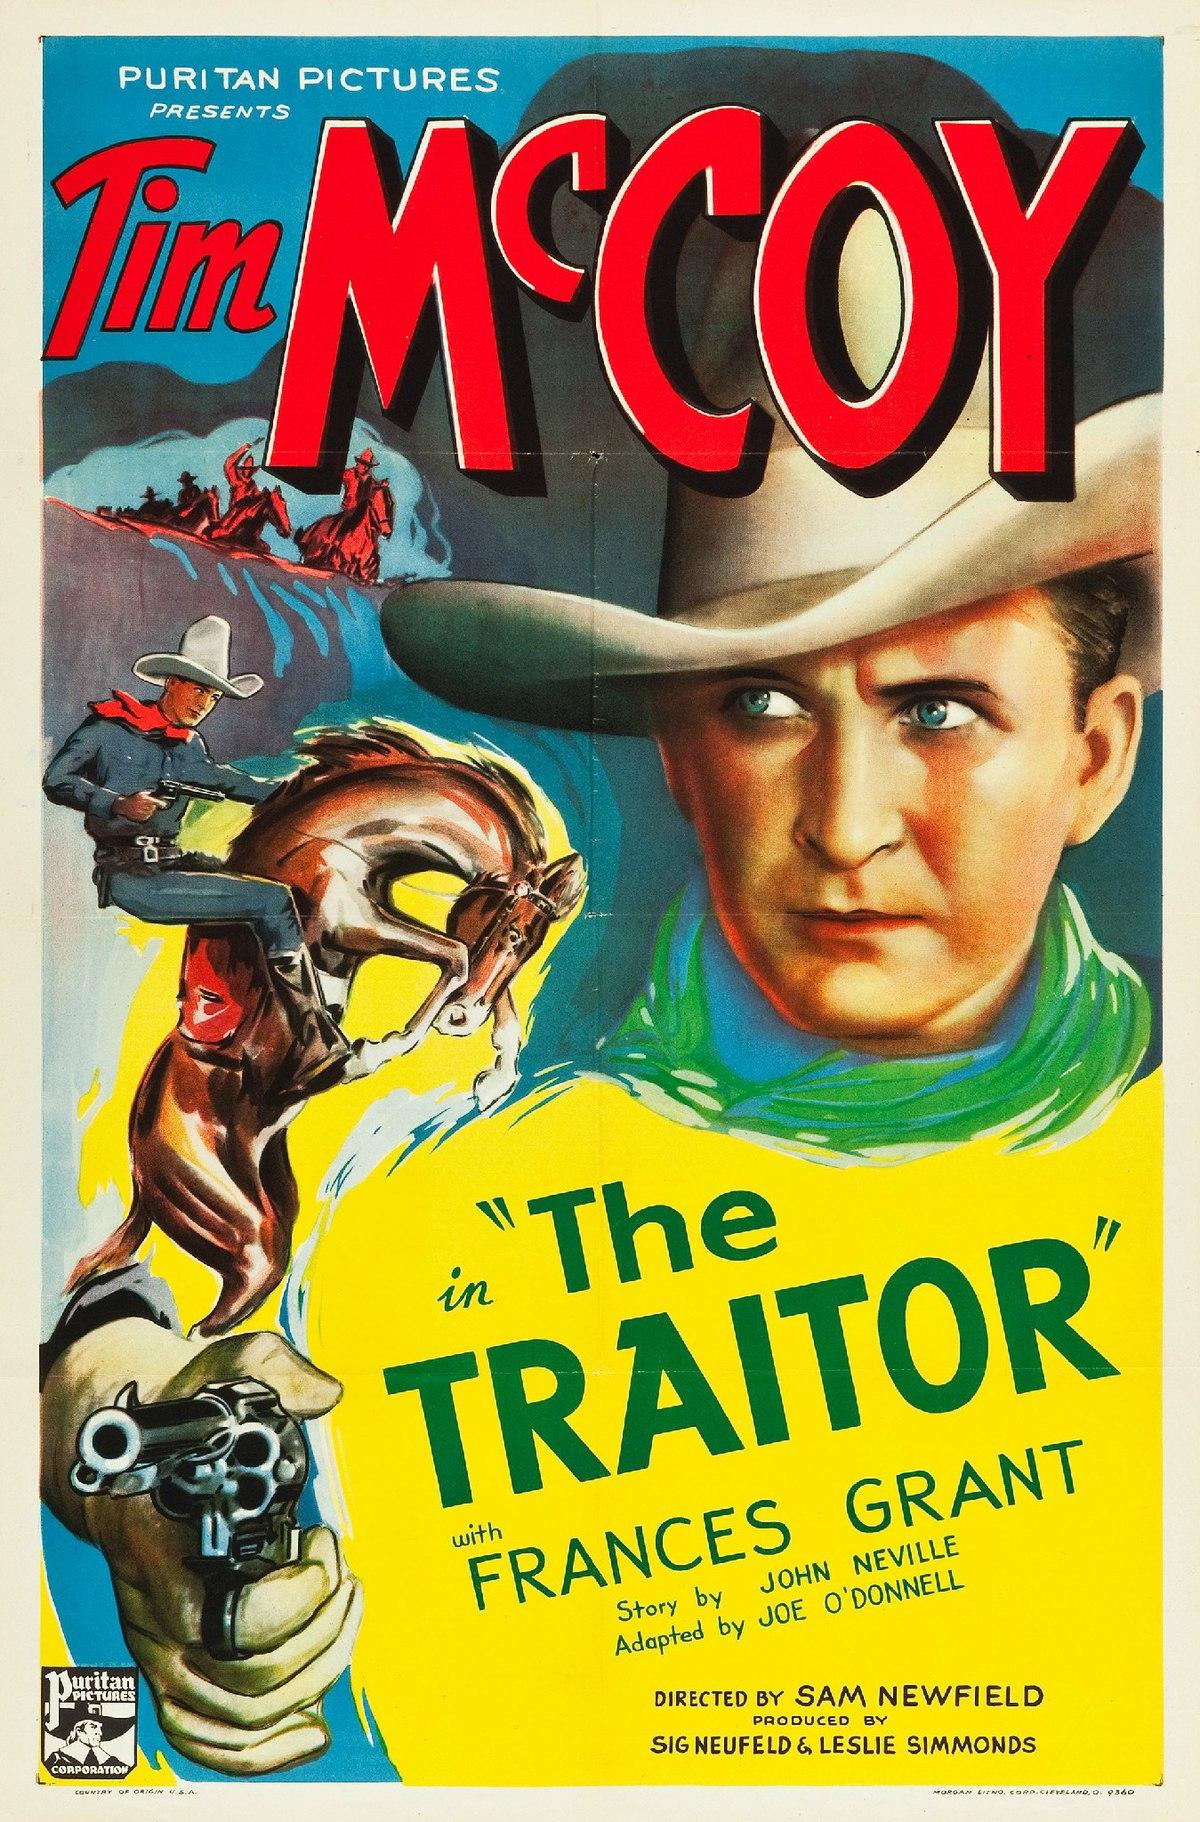 The Traitor 1936 American Film Wikipedia